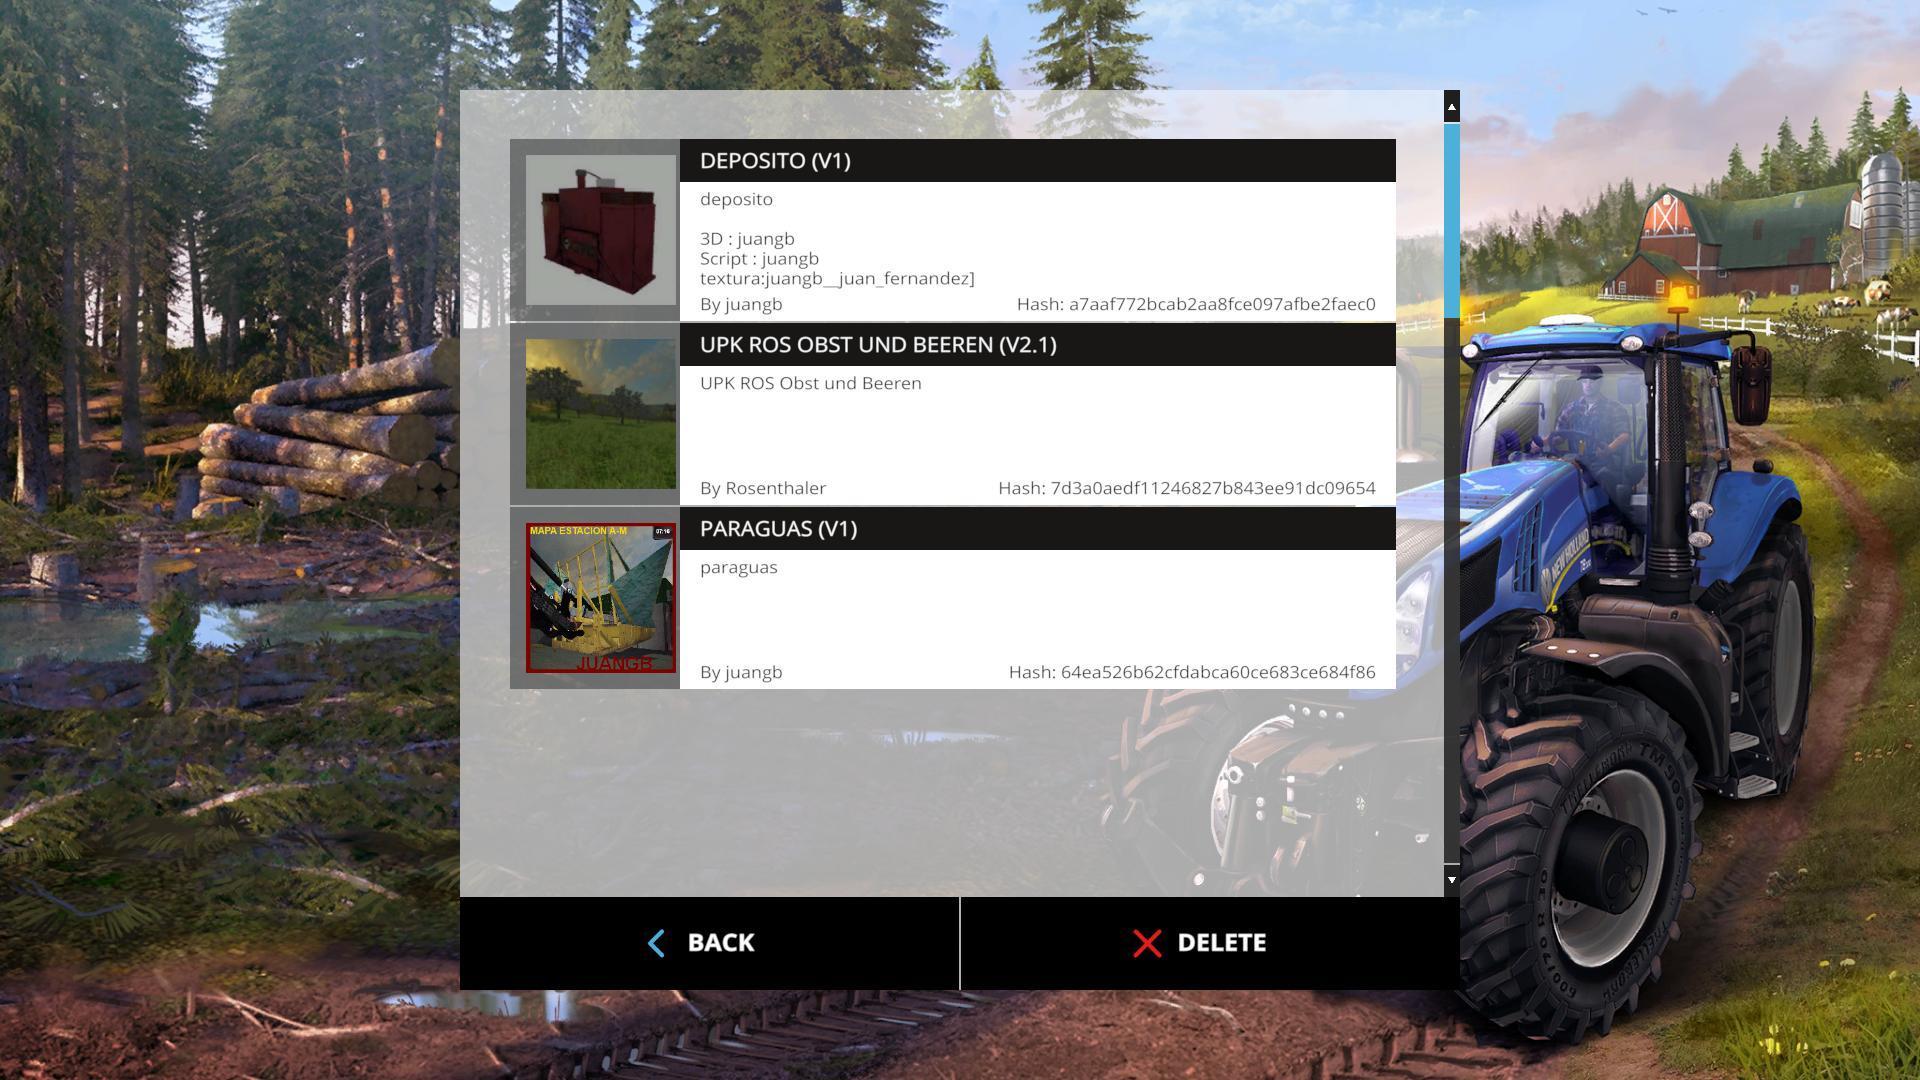 FS 17 Cutters  Farming Simulator 2017  Mods  Mods for